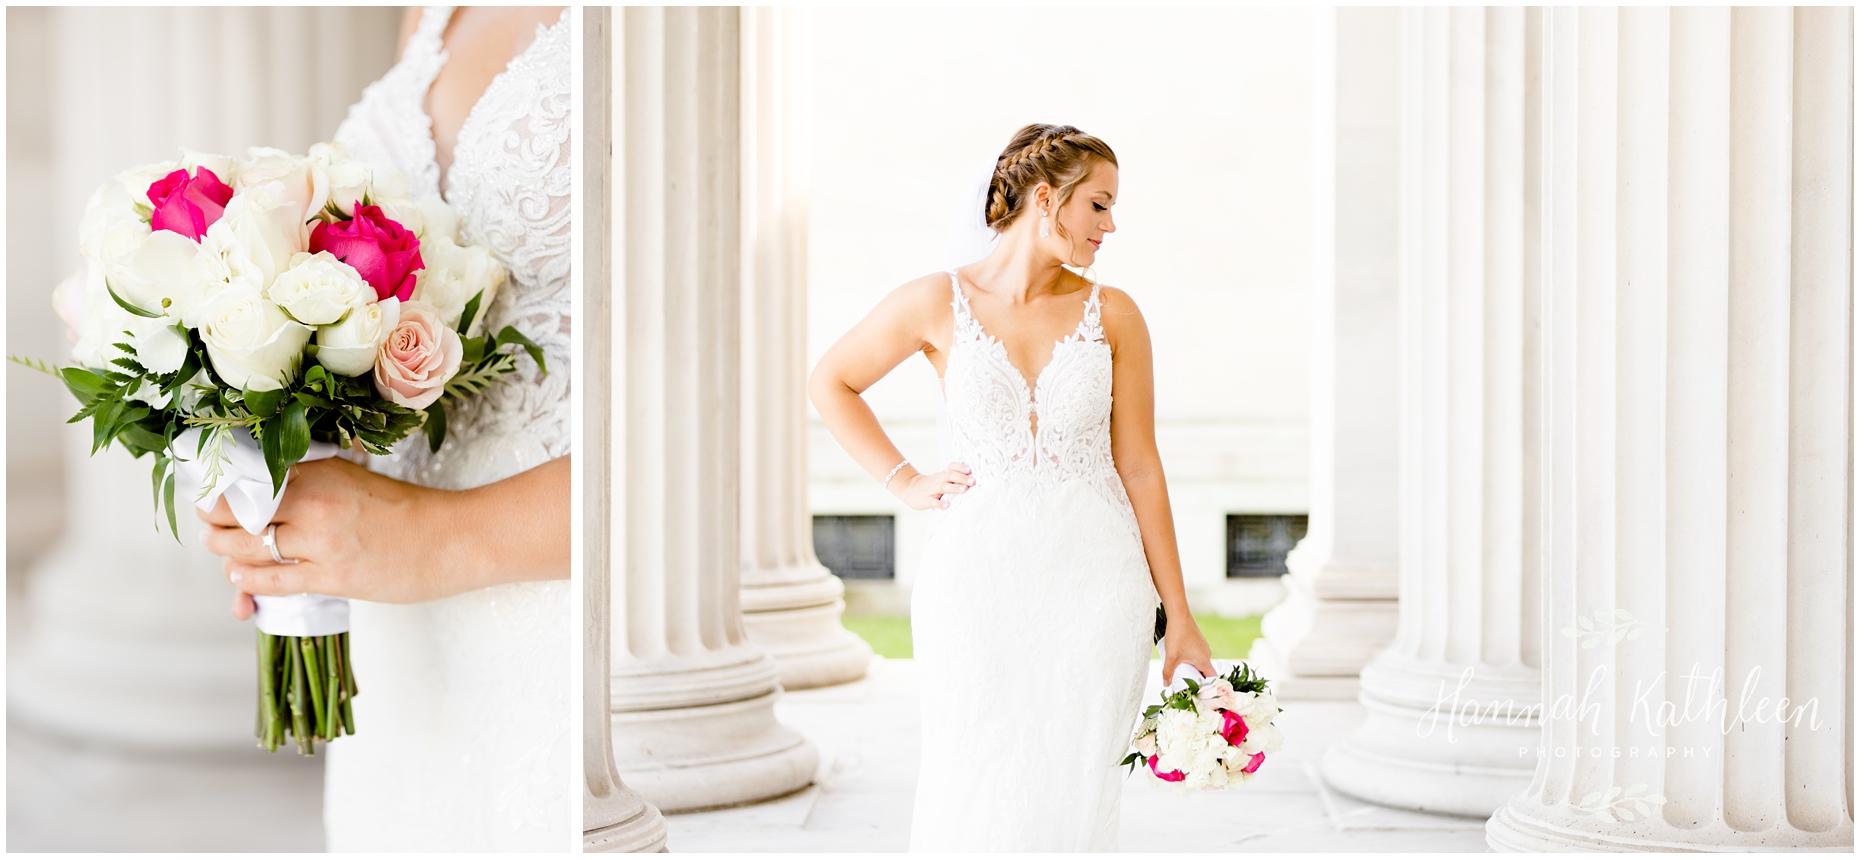 Tom_Taylor_Salvatores_Wedding_Photographer_Buffalo_NY